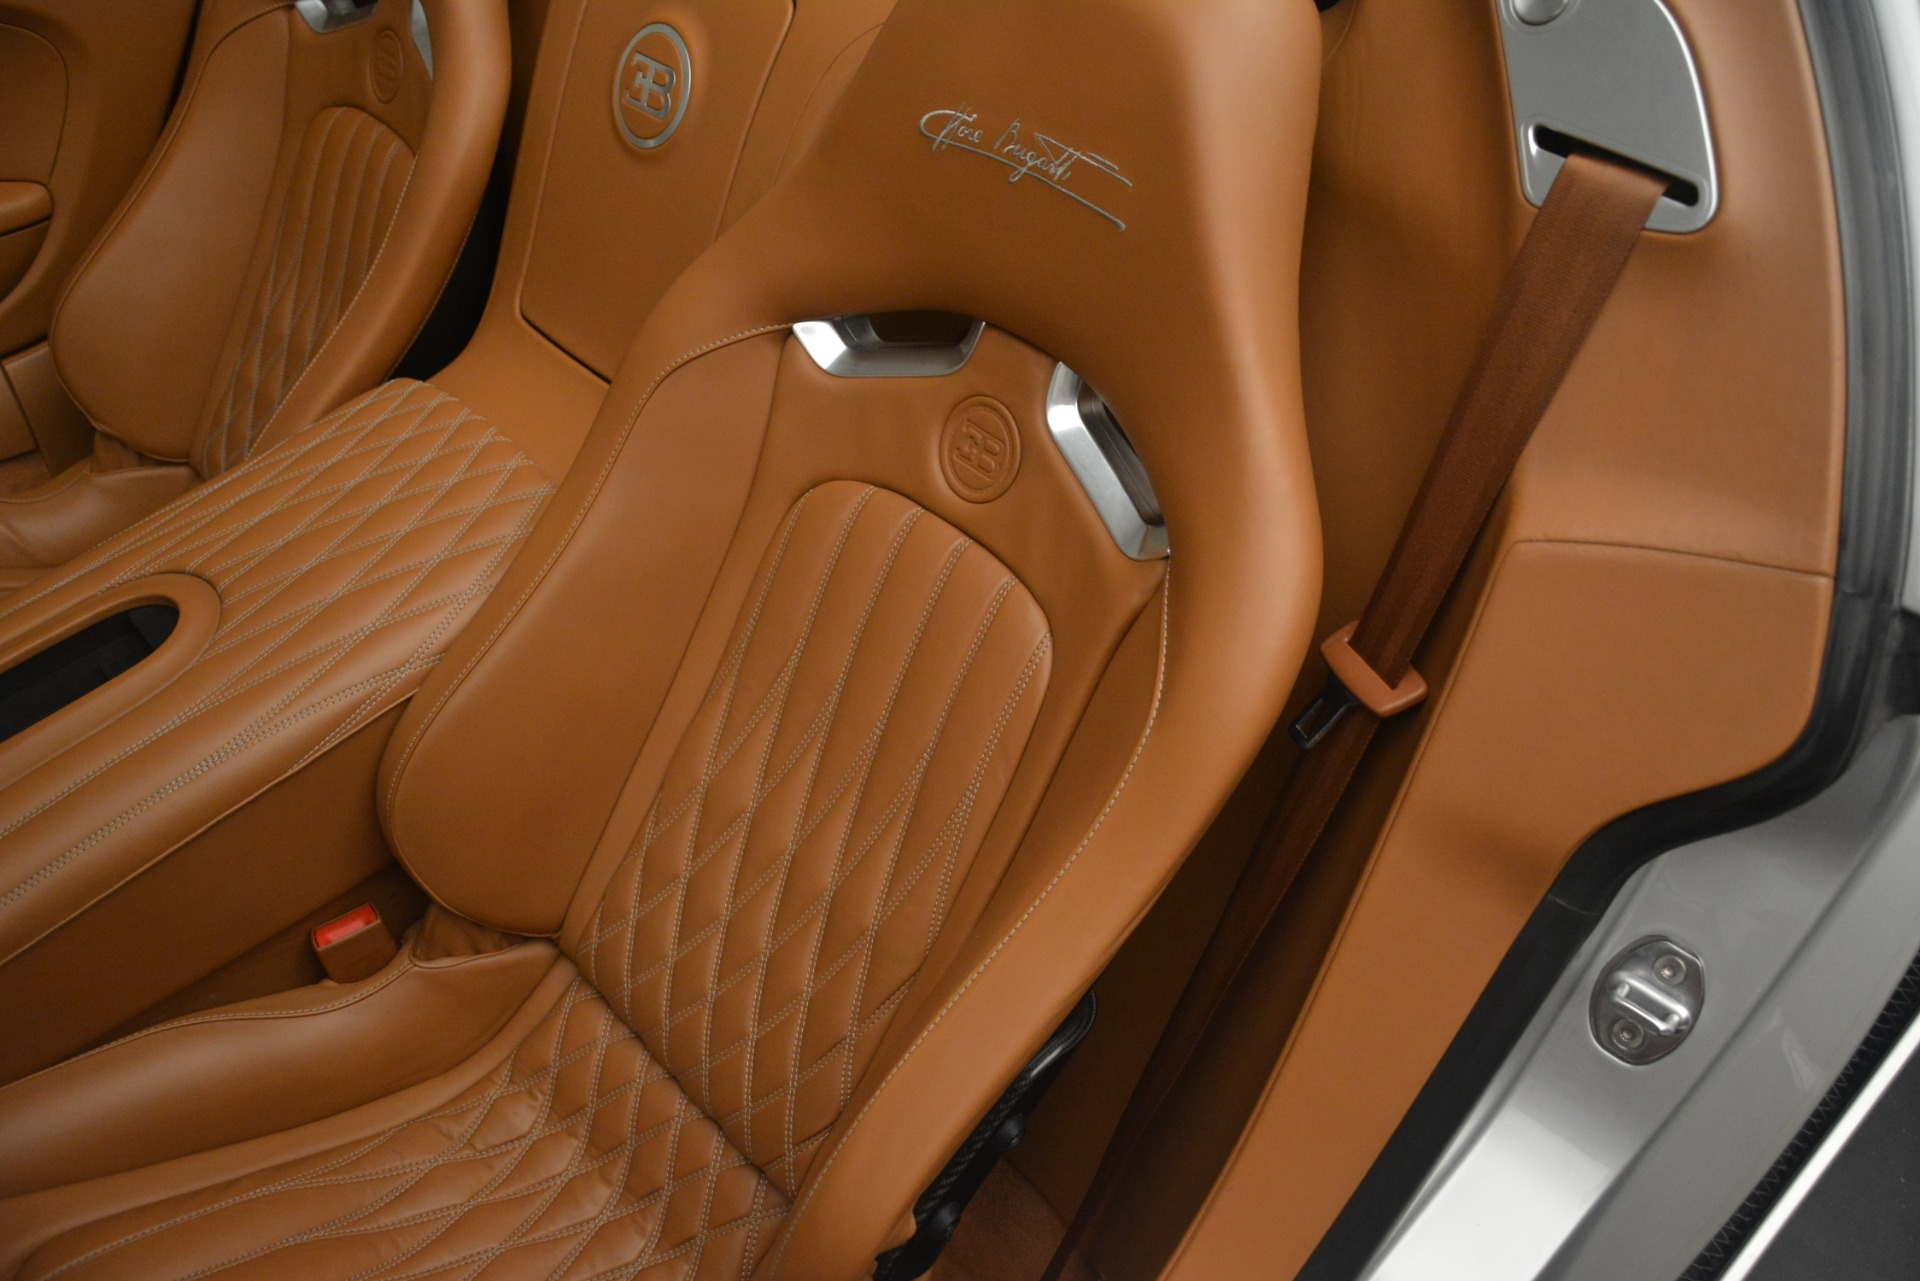 Used 2010 Bugatti Veyron 16.4 Grand Sport For Sale In Greenwich, CT 3159_p26